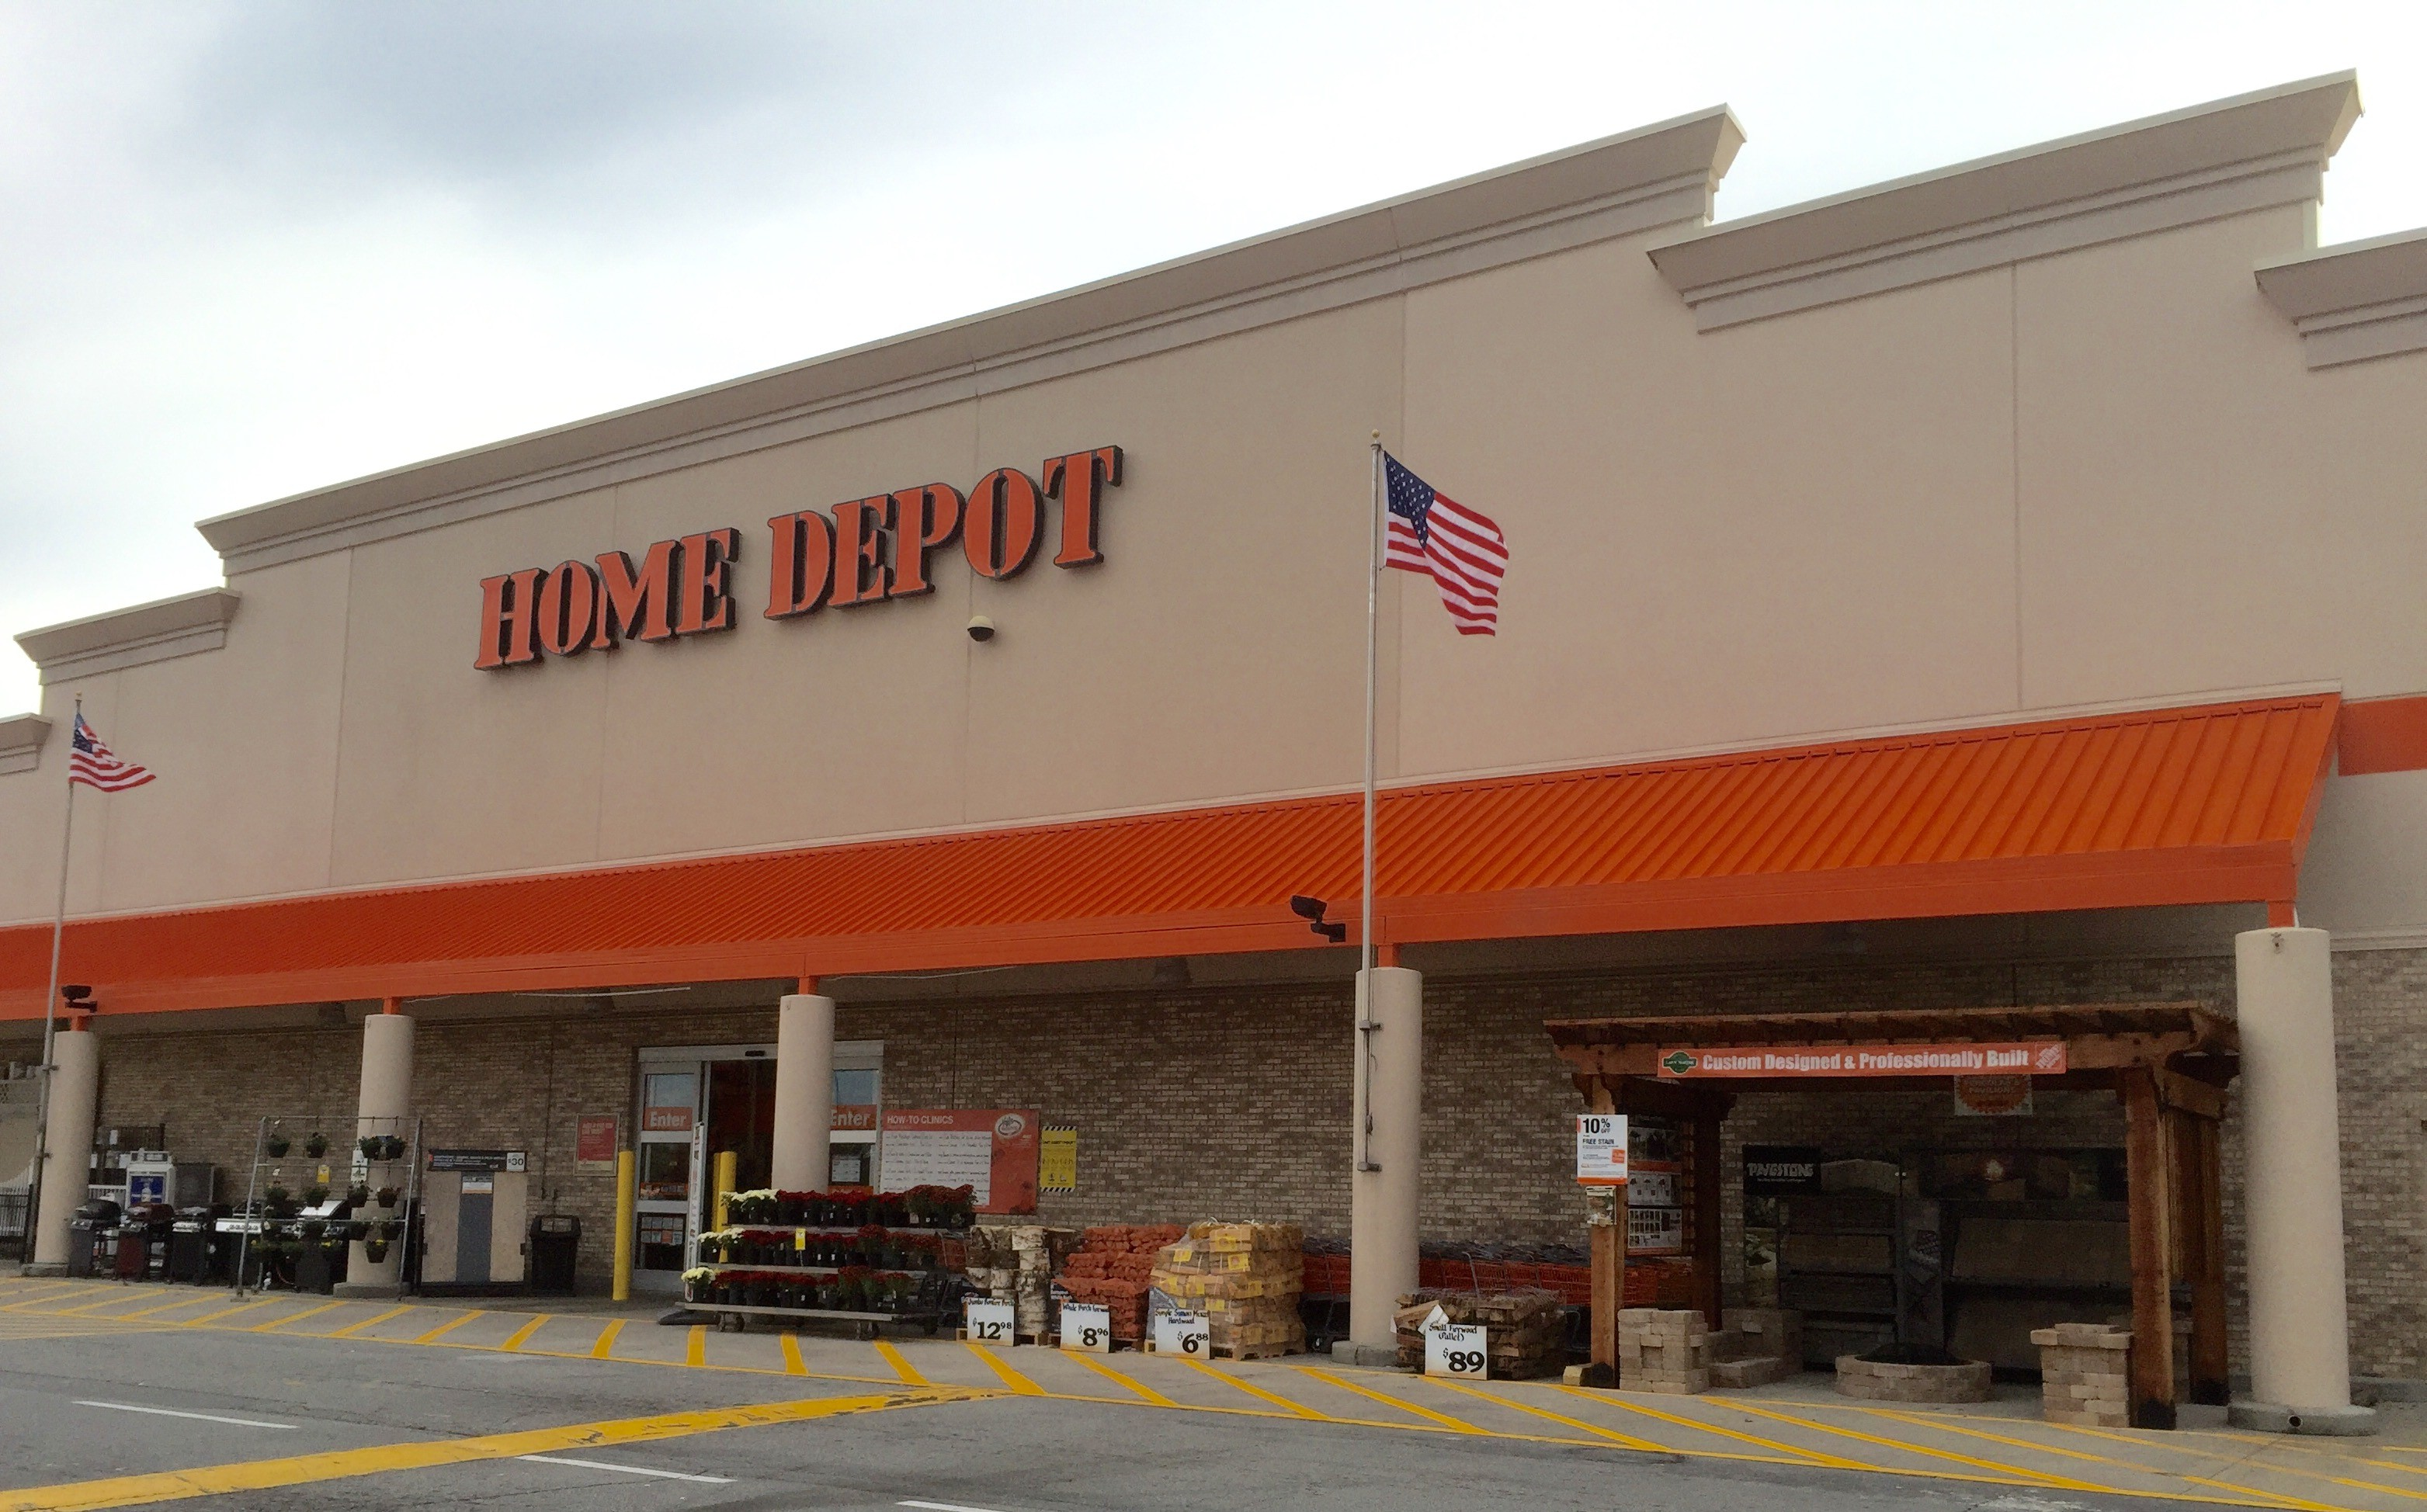 The Home Depot 875 Lawrenceville Suwanee Rd Lawrenceville Ga 30043 Yp Com